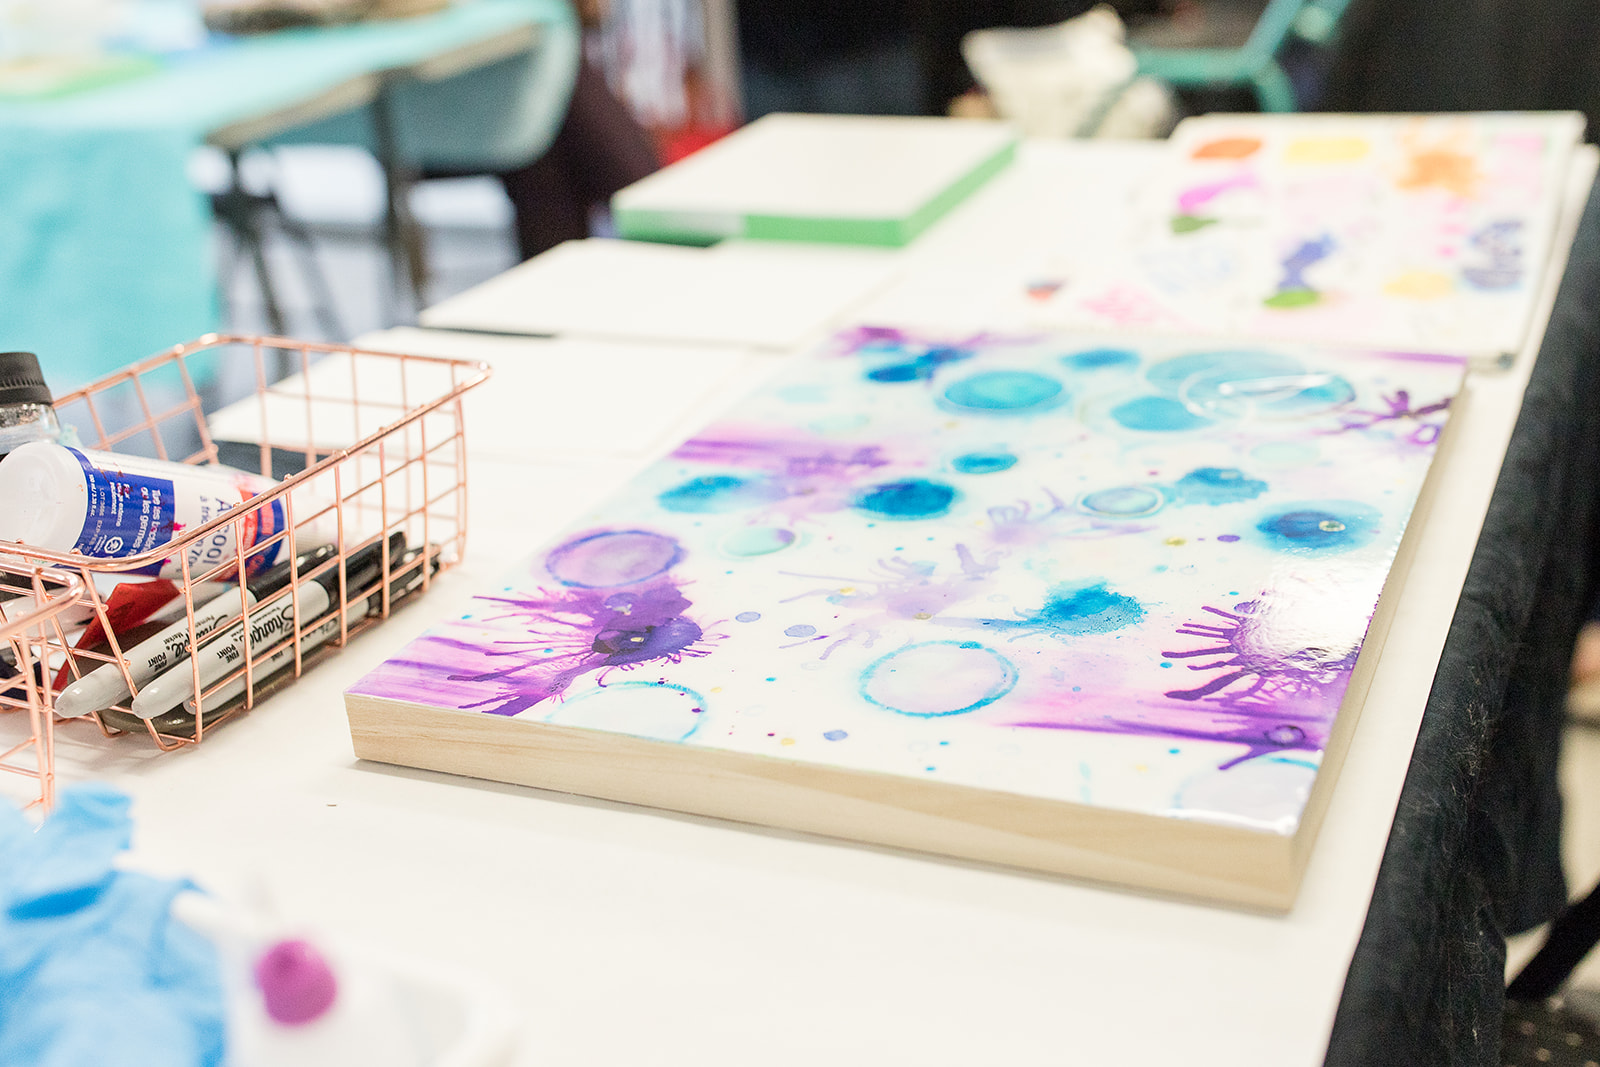 Resonance-art-studio-workshop-brand-photography-print-004.jpg